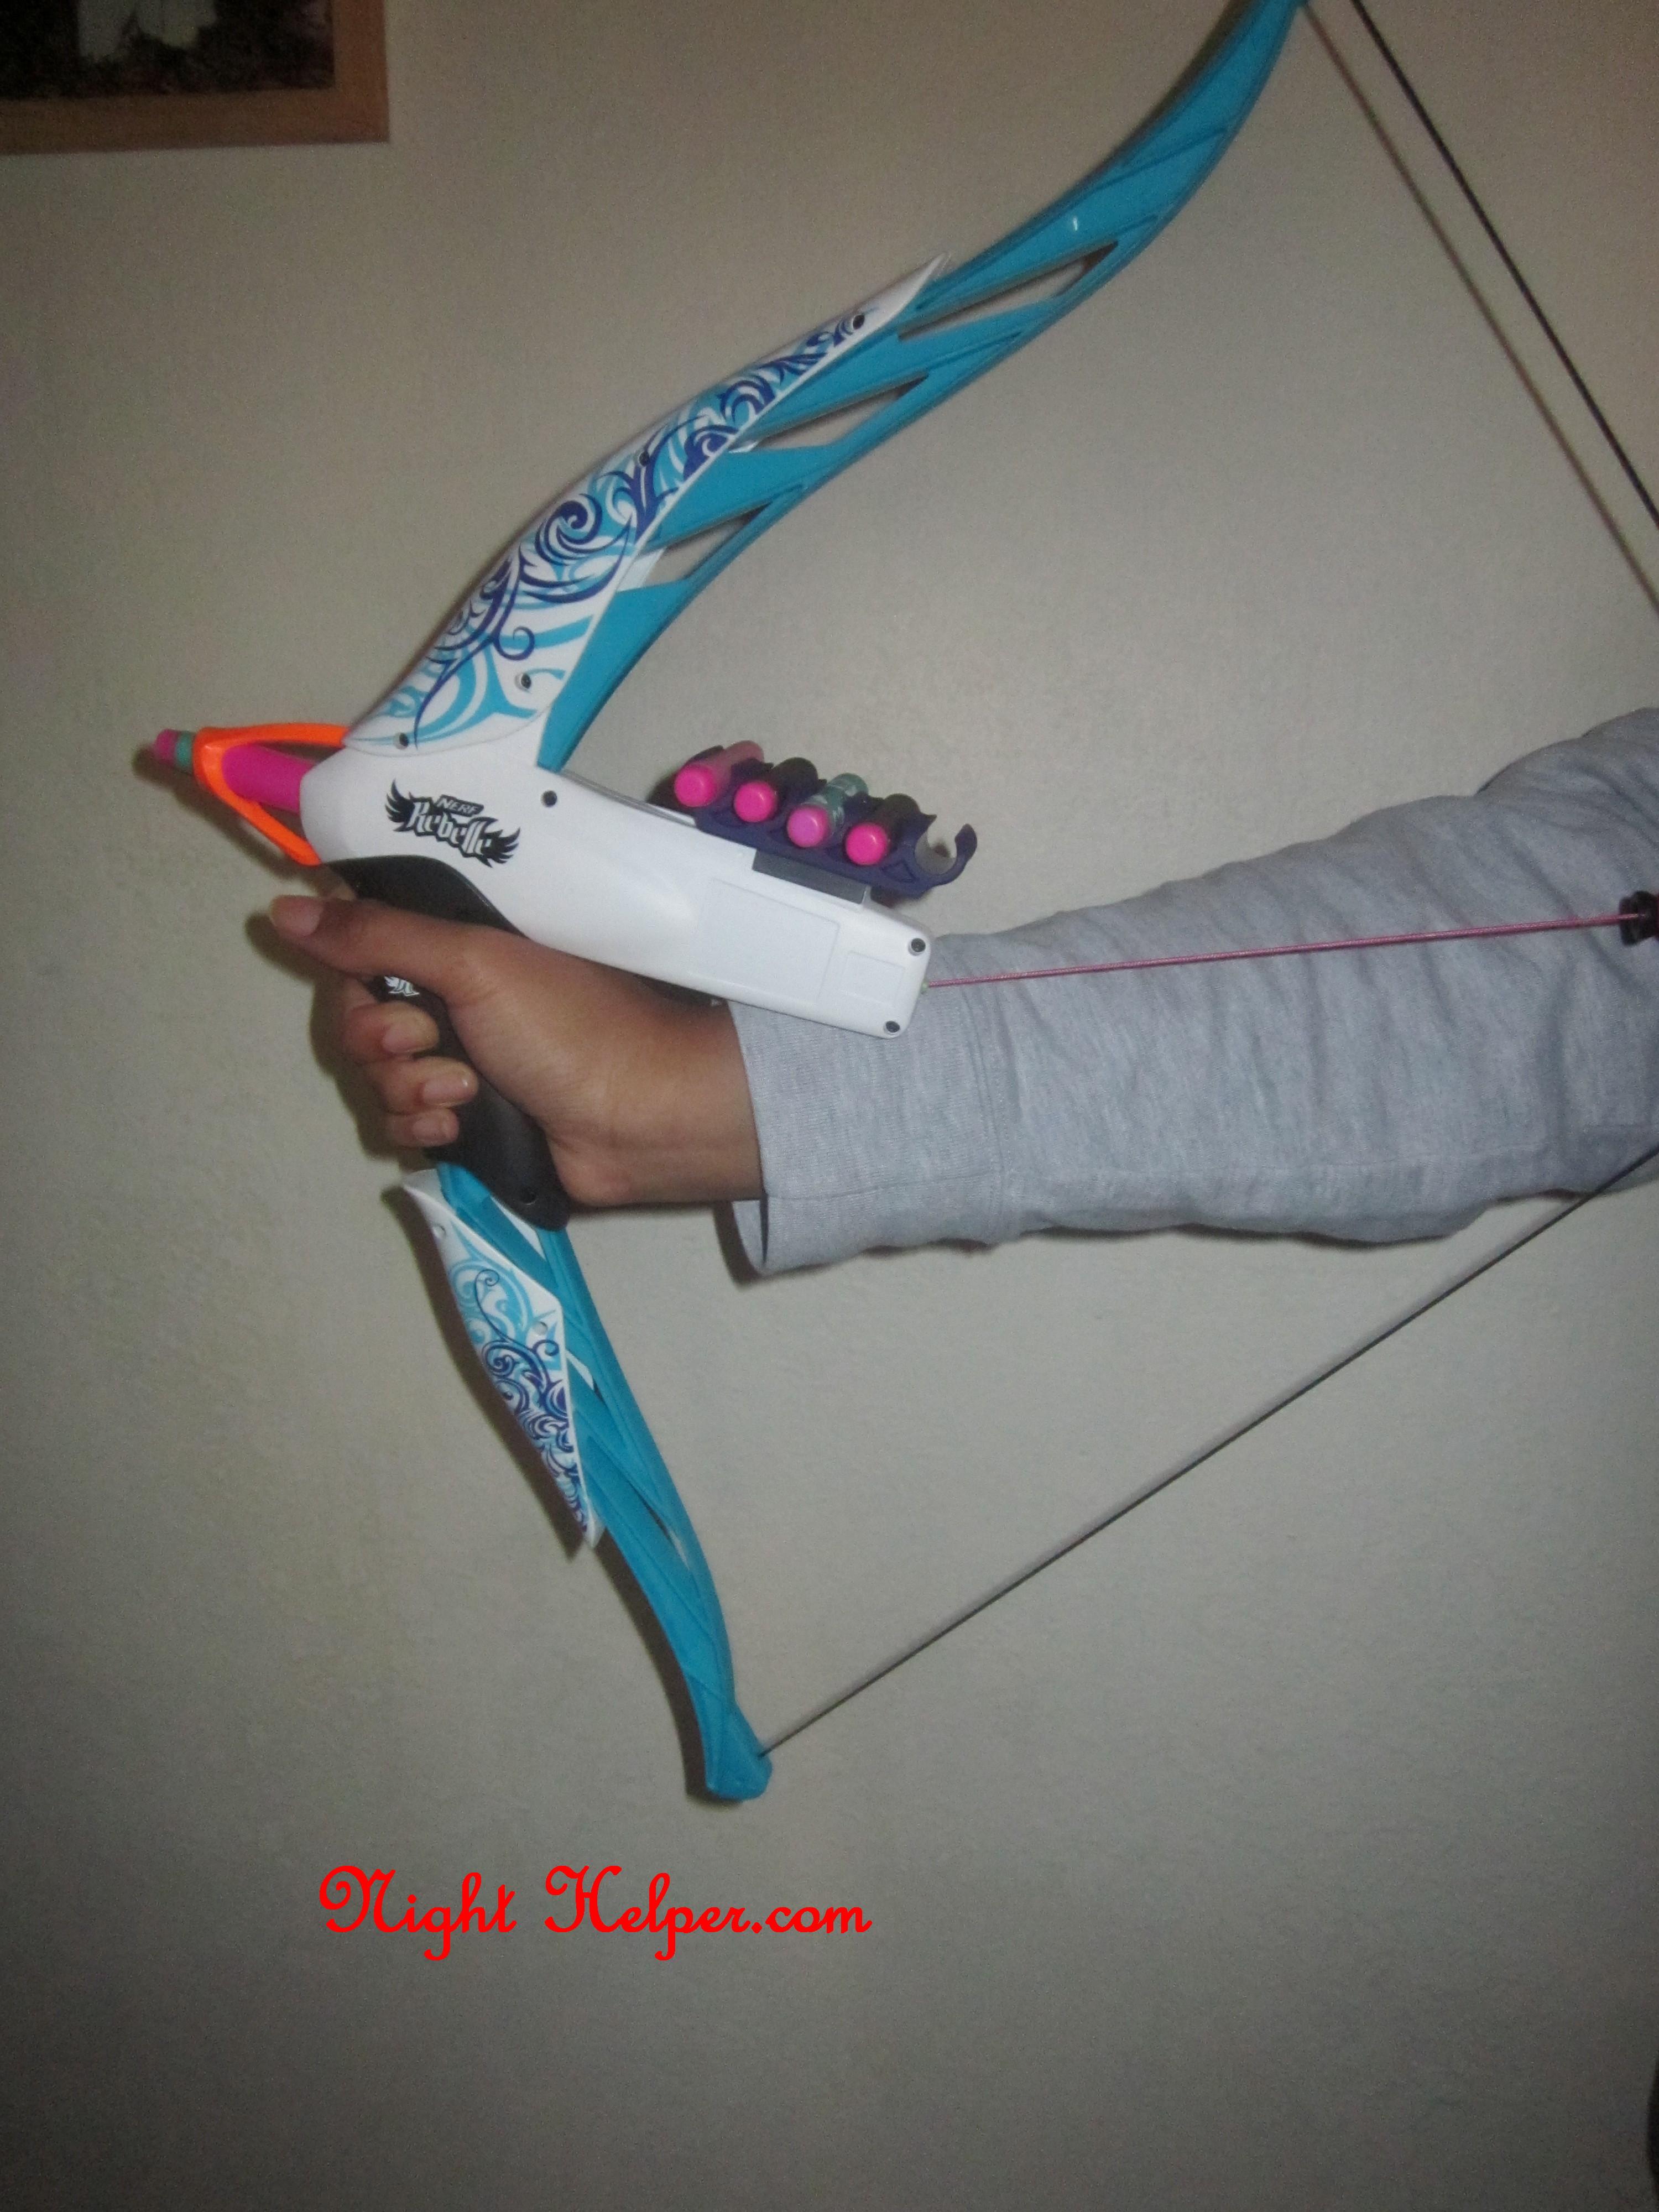 nerf rebelle heartbreaker bow blaster toy set night helper